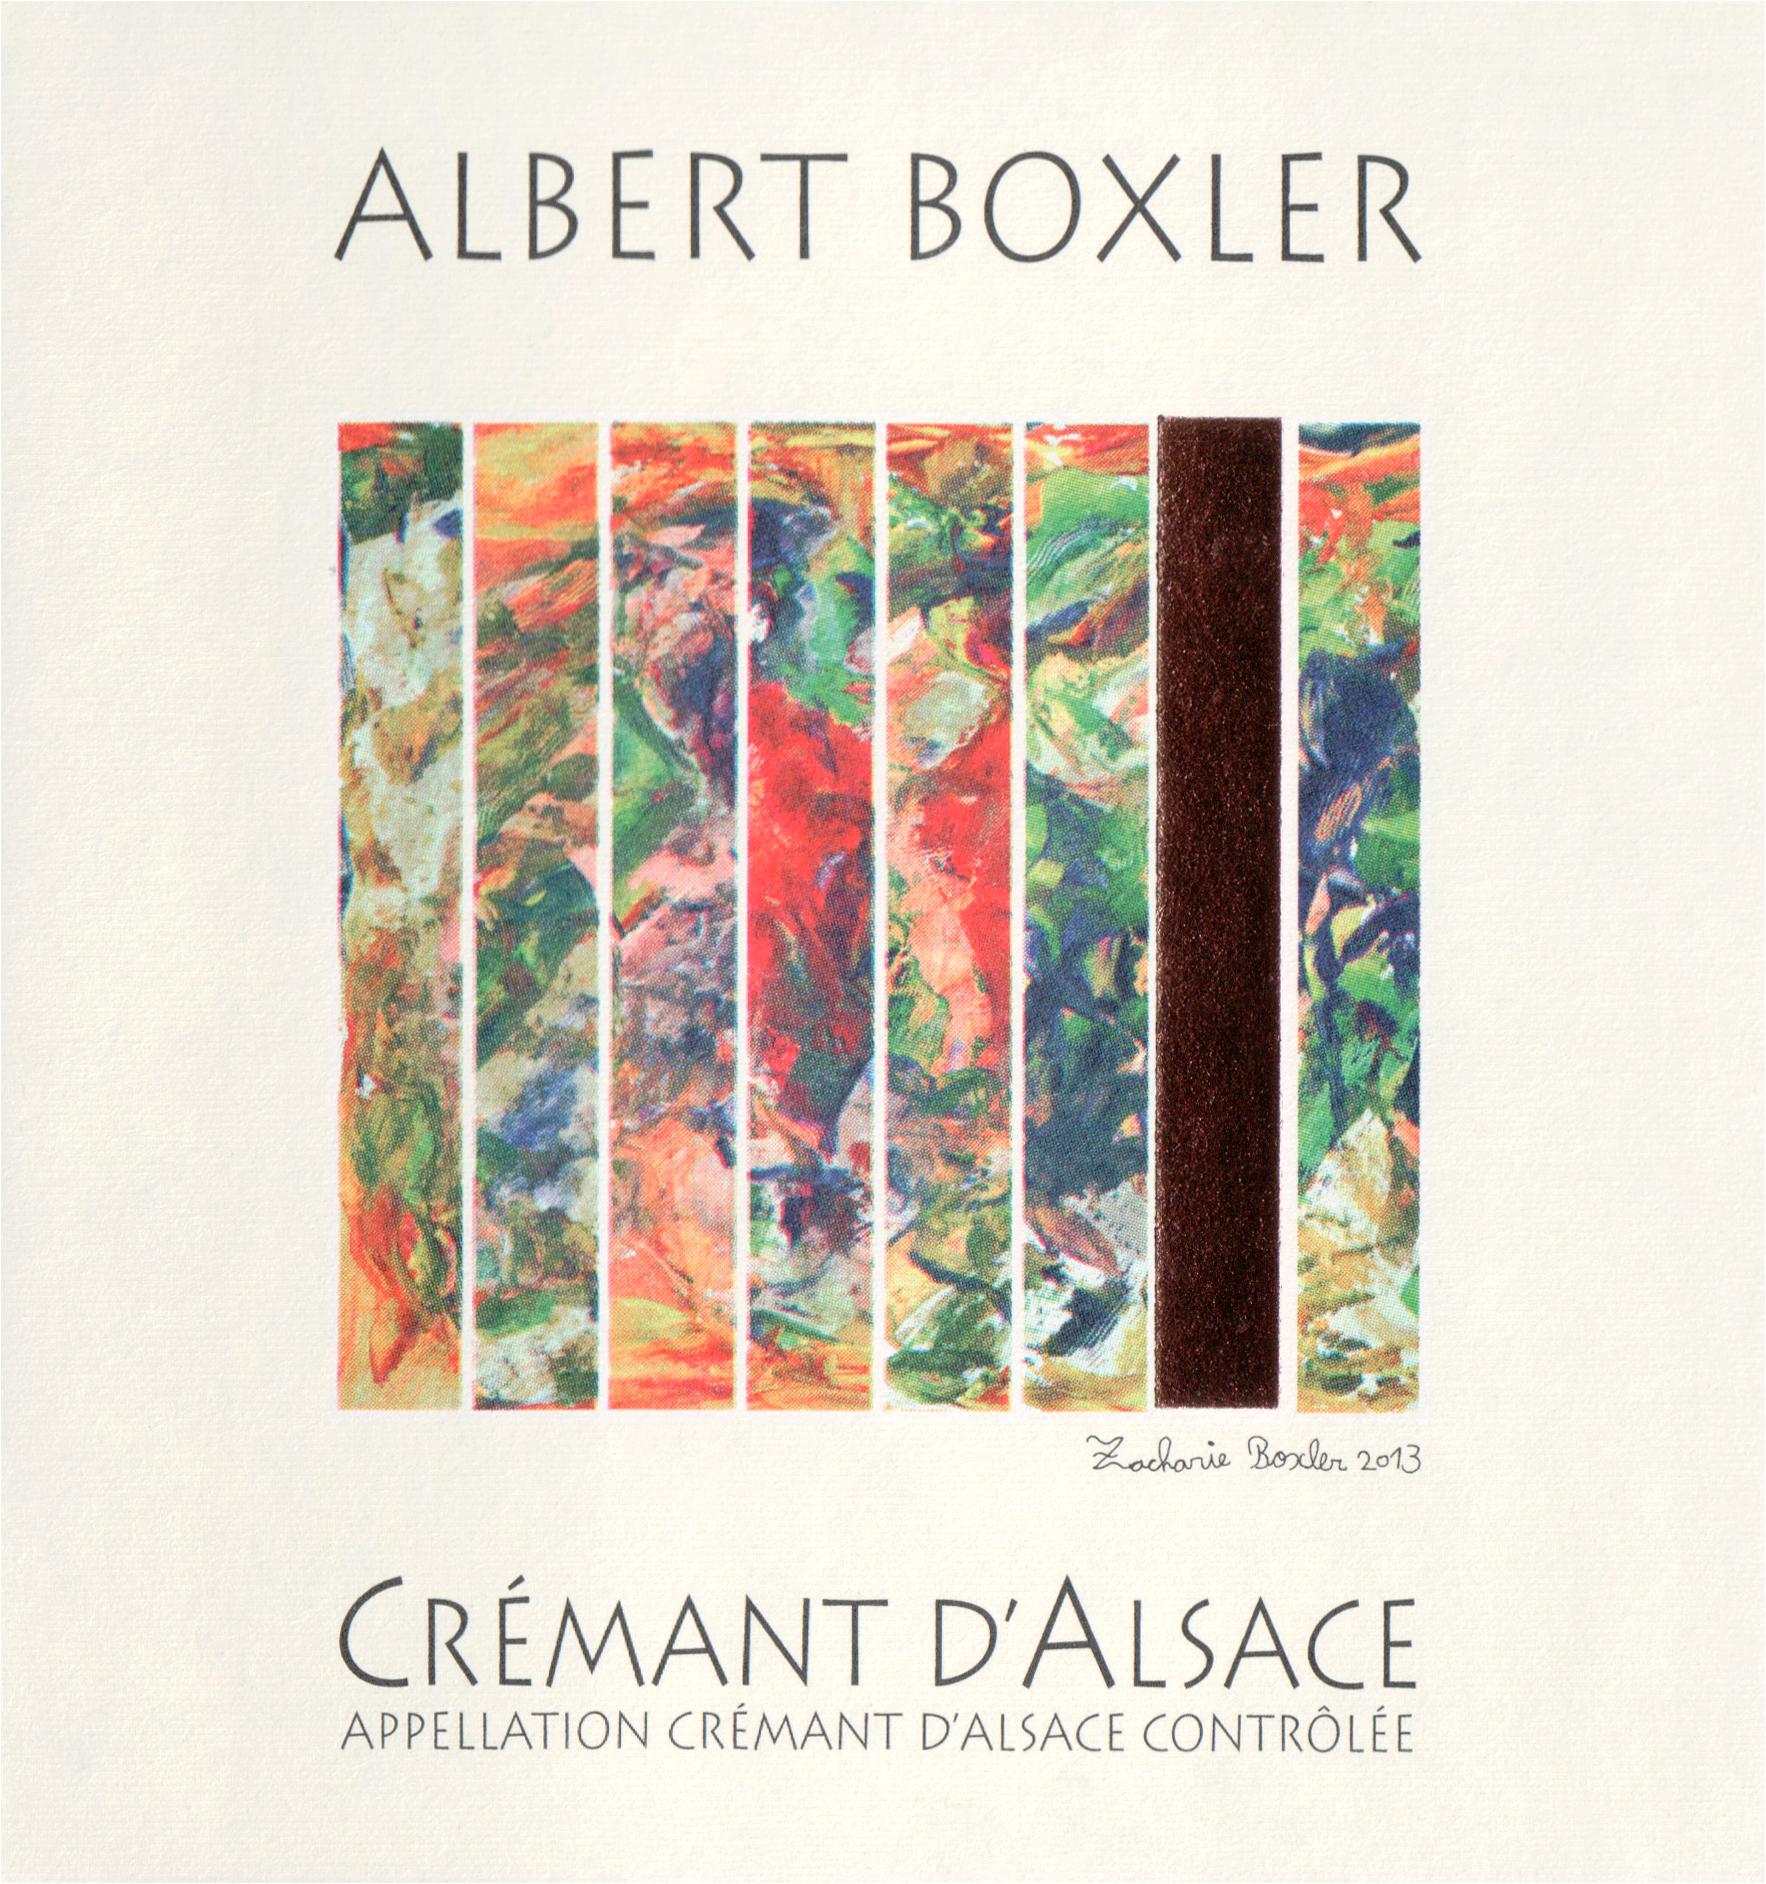 Albert Boxler Cremant D